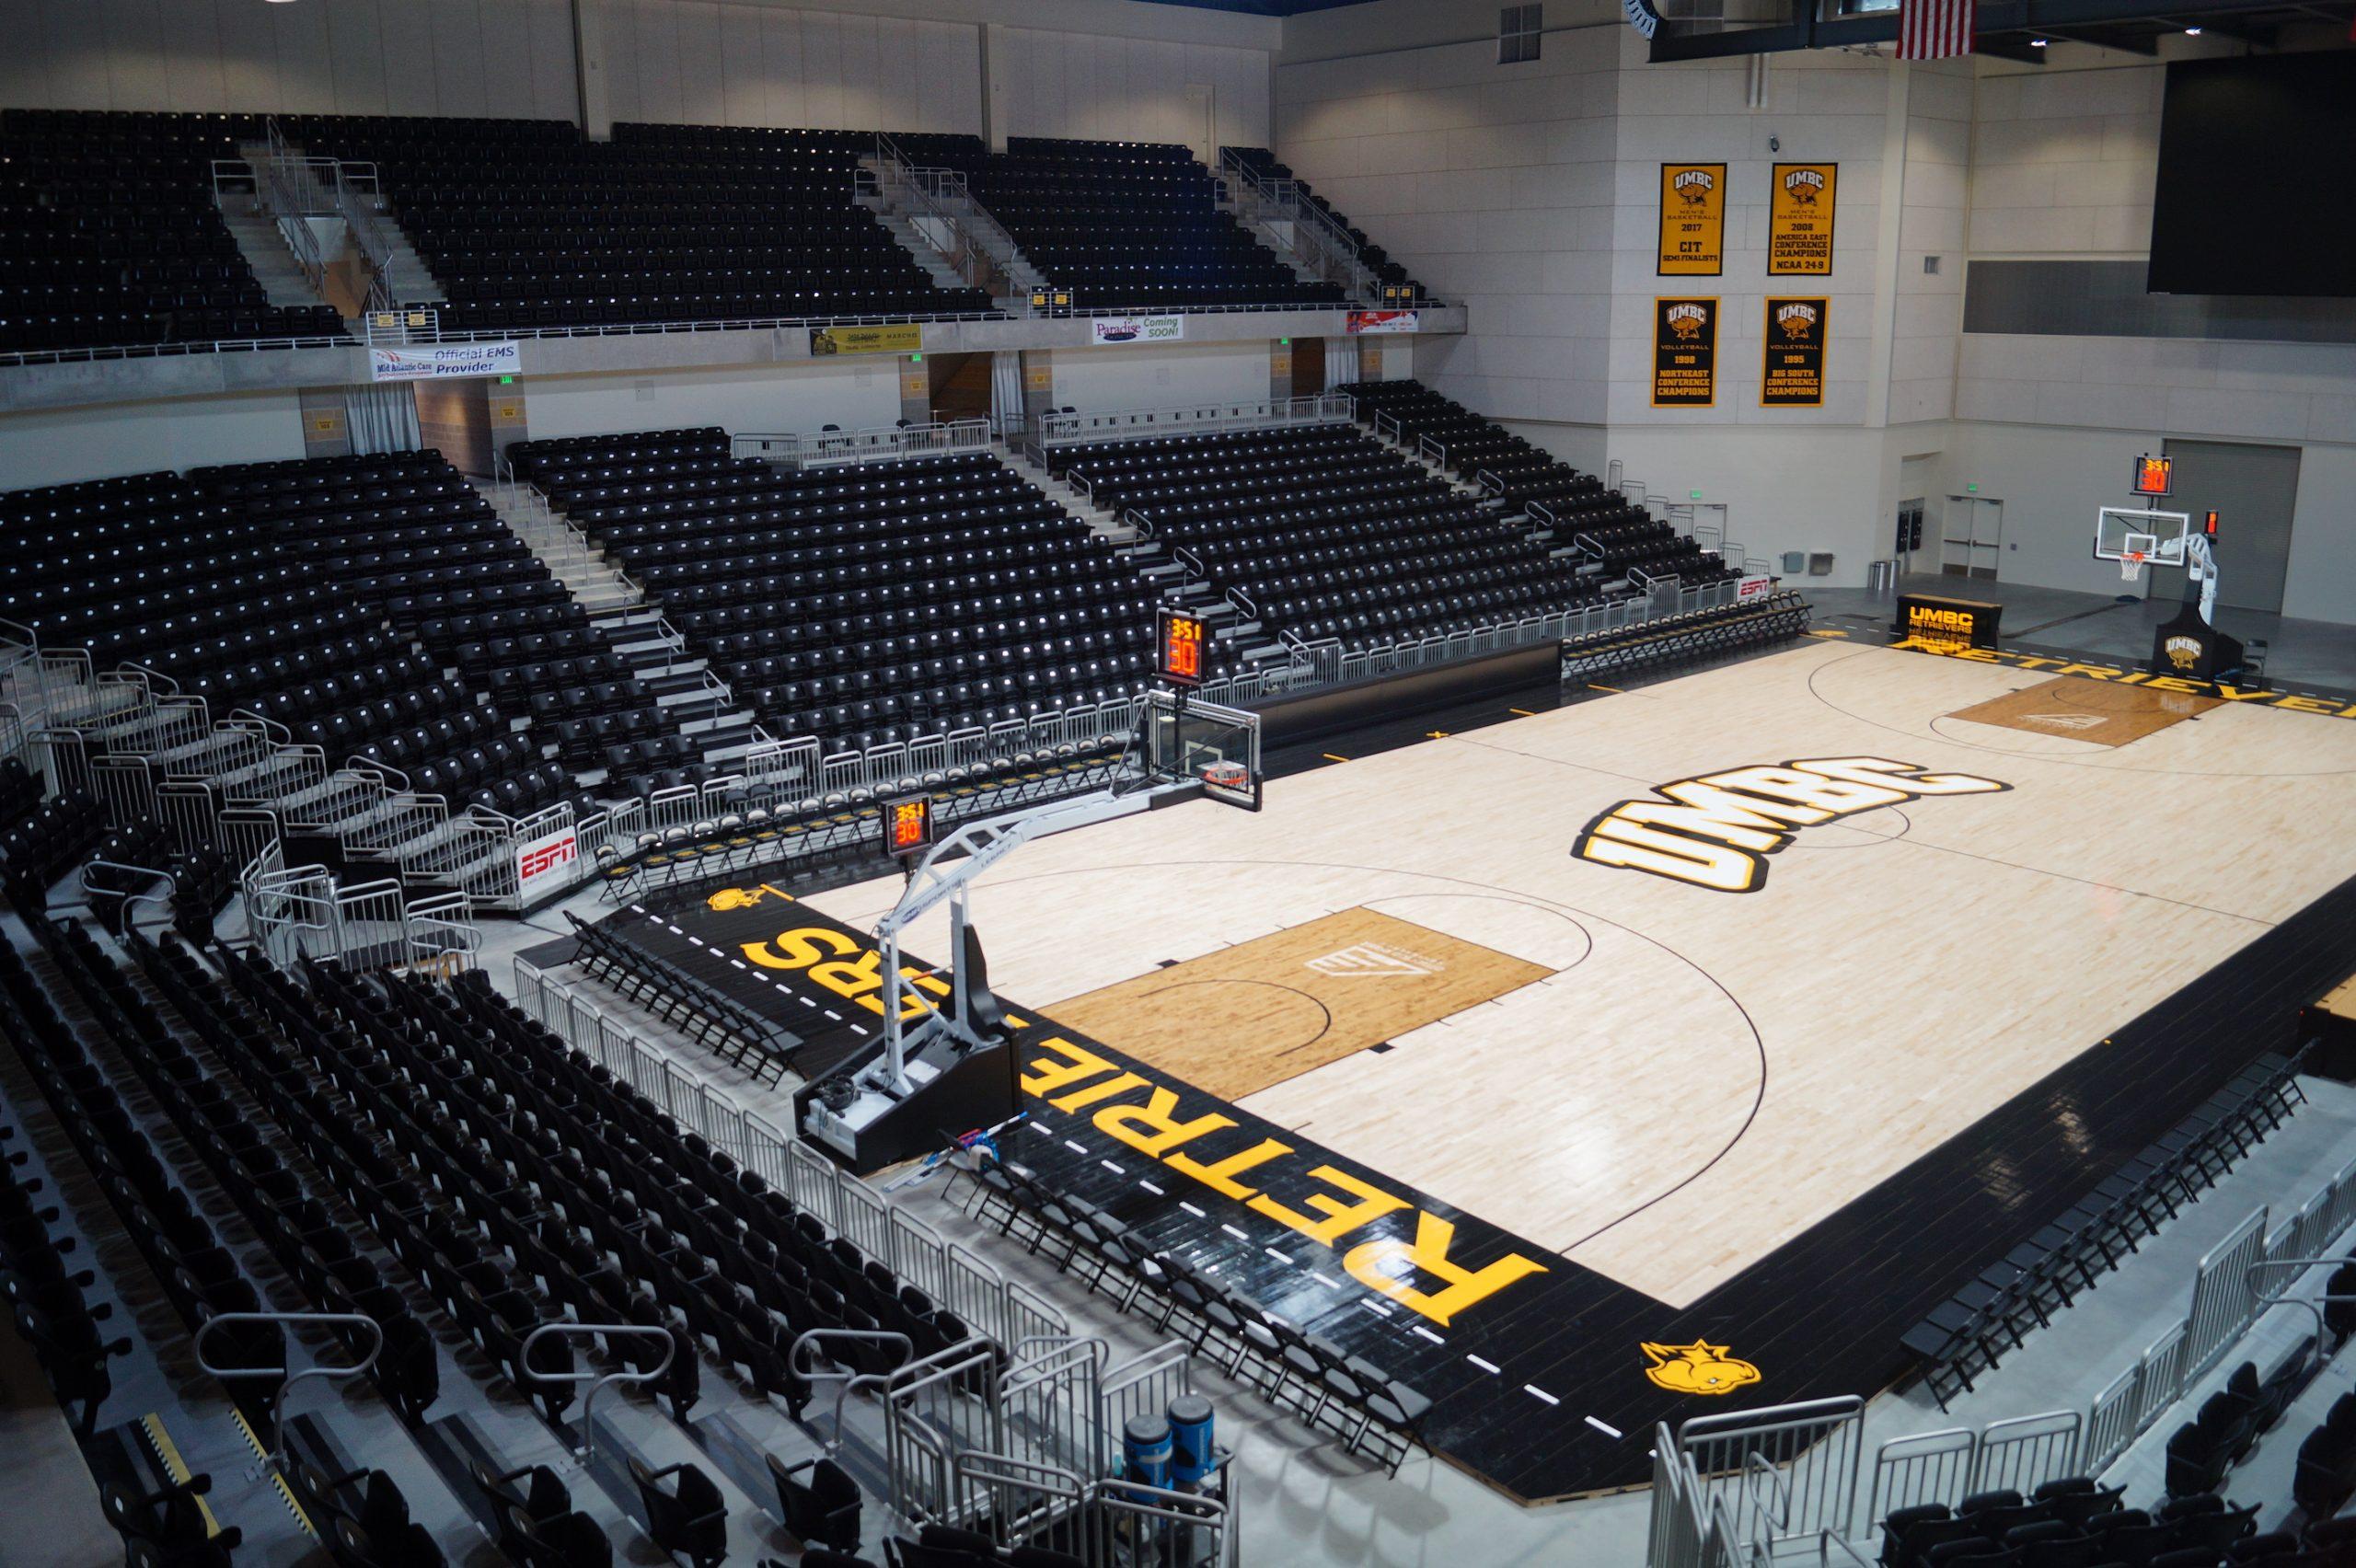 UMBC's Basketball Stadium